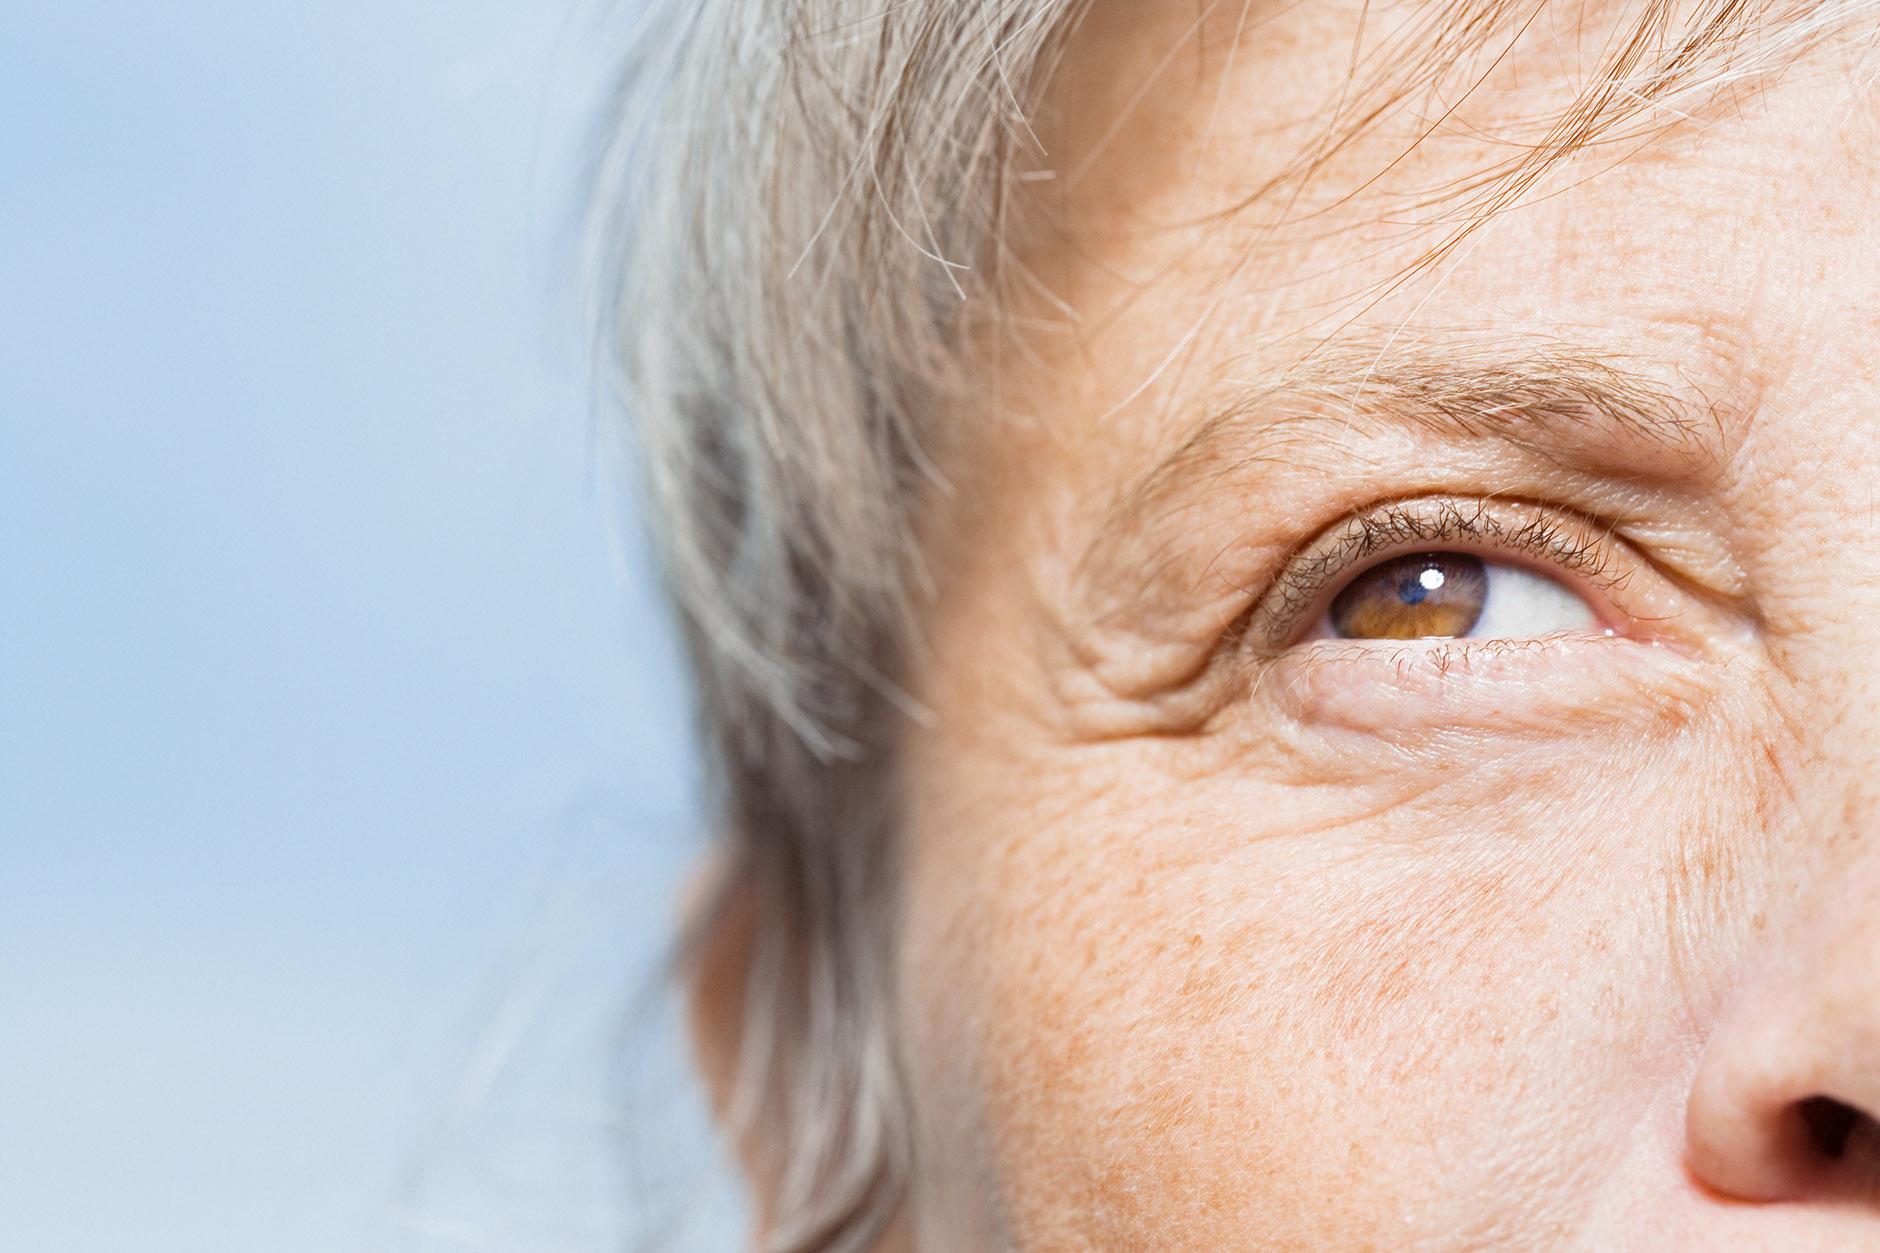 older woman closeup face eyes iStock.